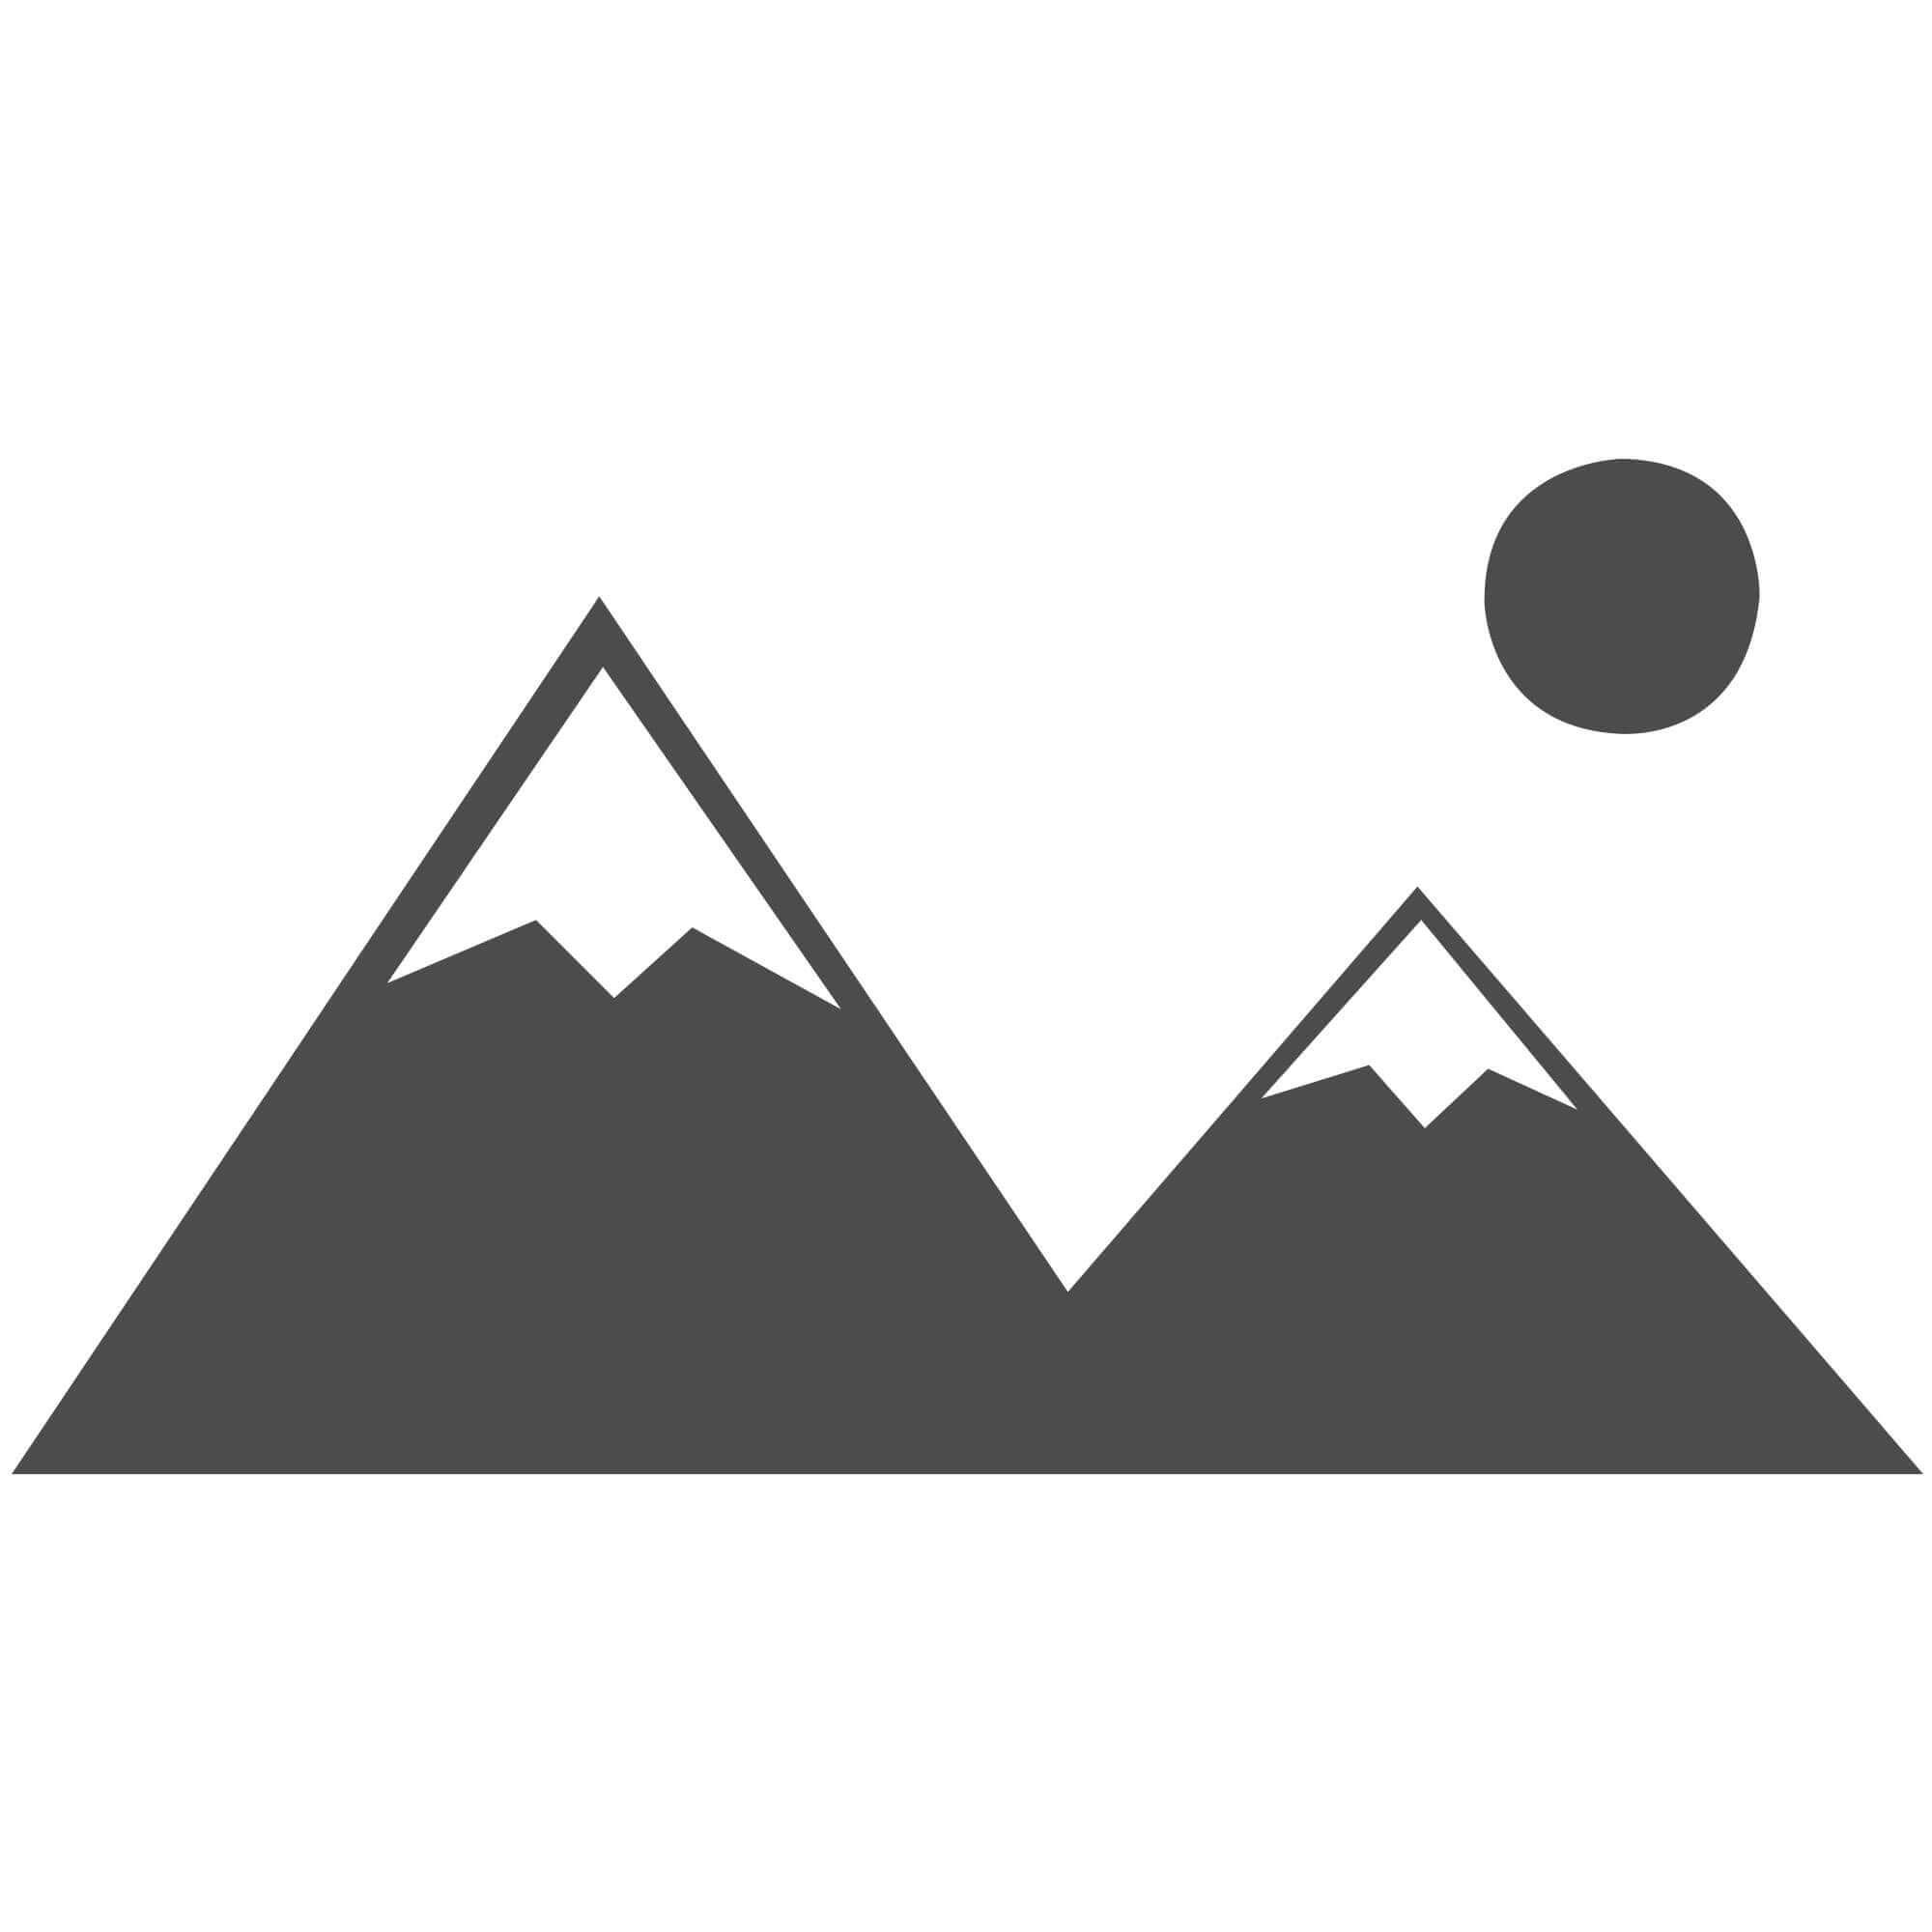 "Moorish Marrakech Cream Rug - Size 120 x 170 cm (4' x 5'7"")"